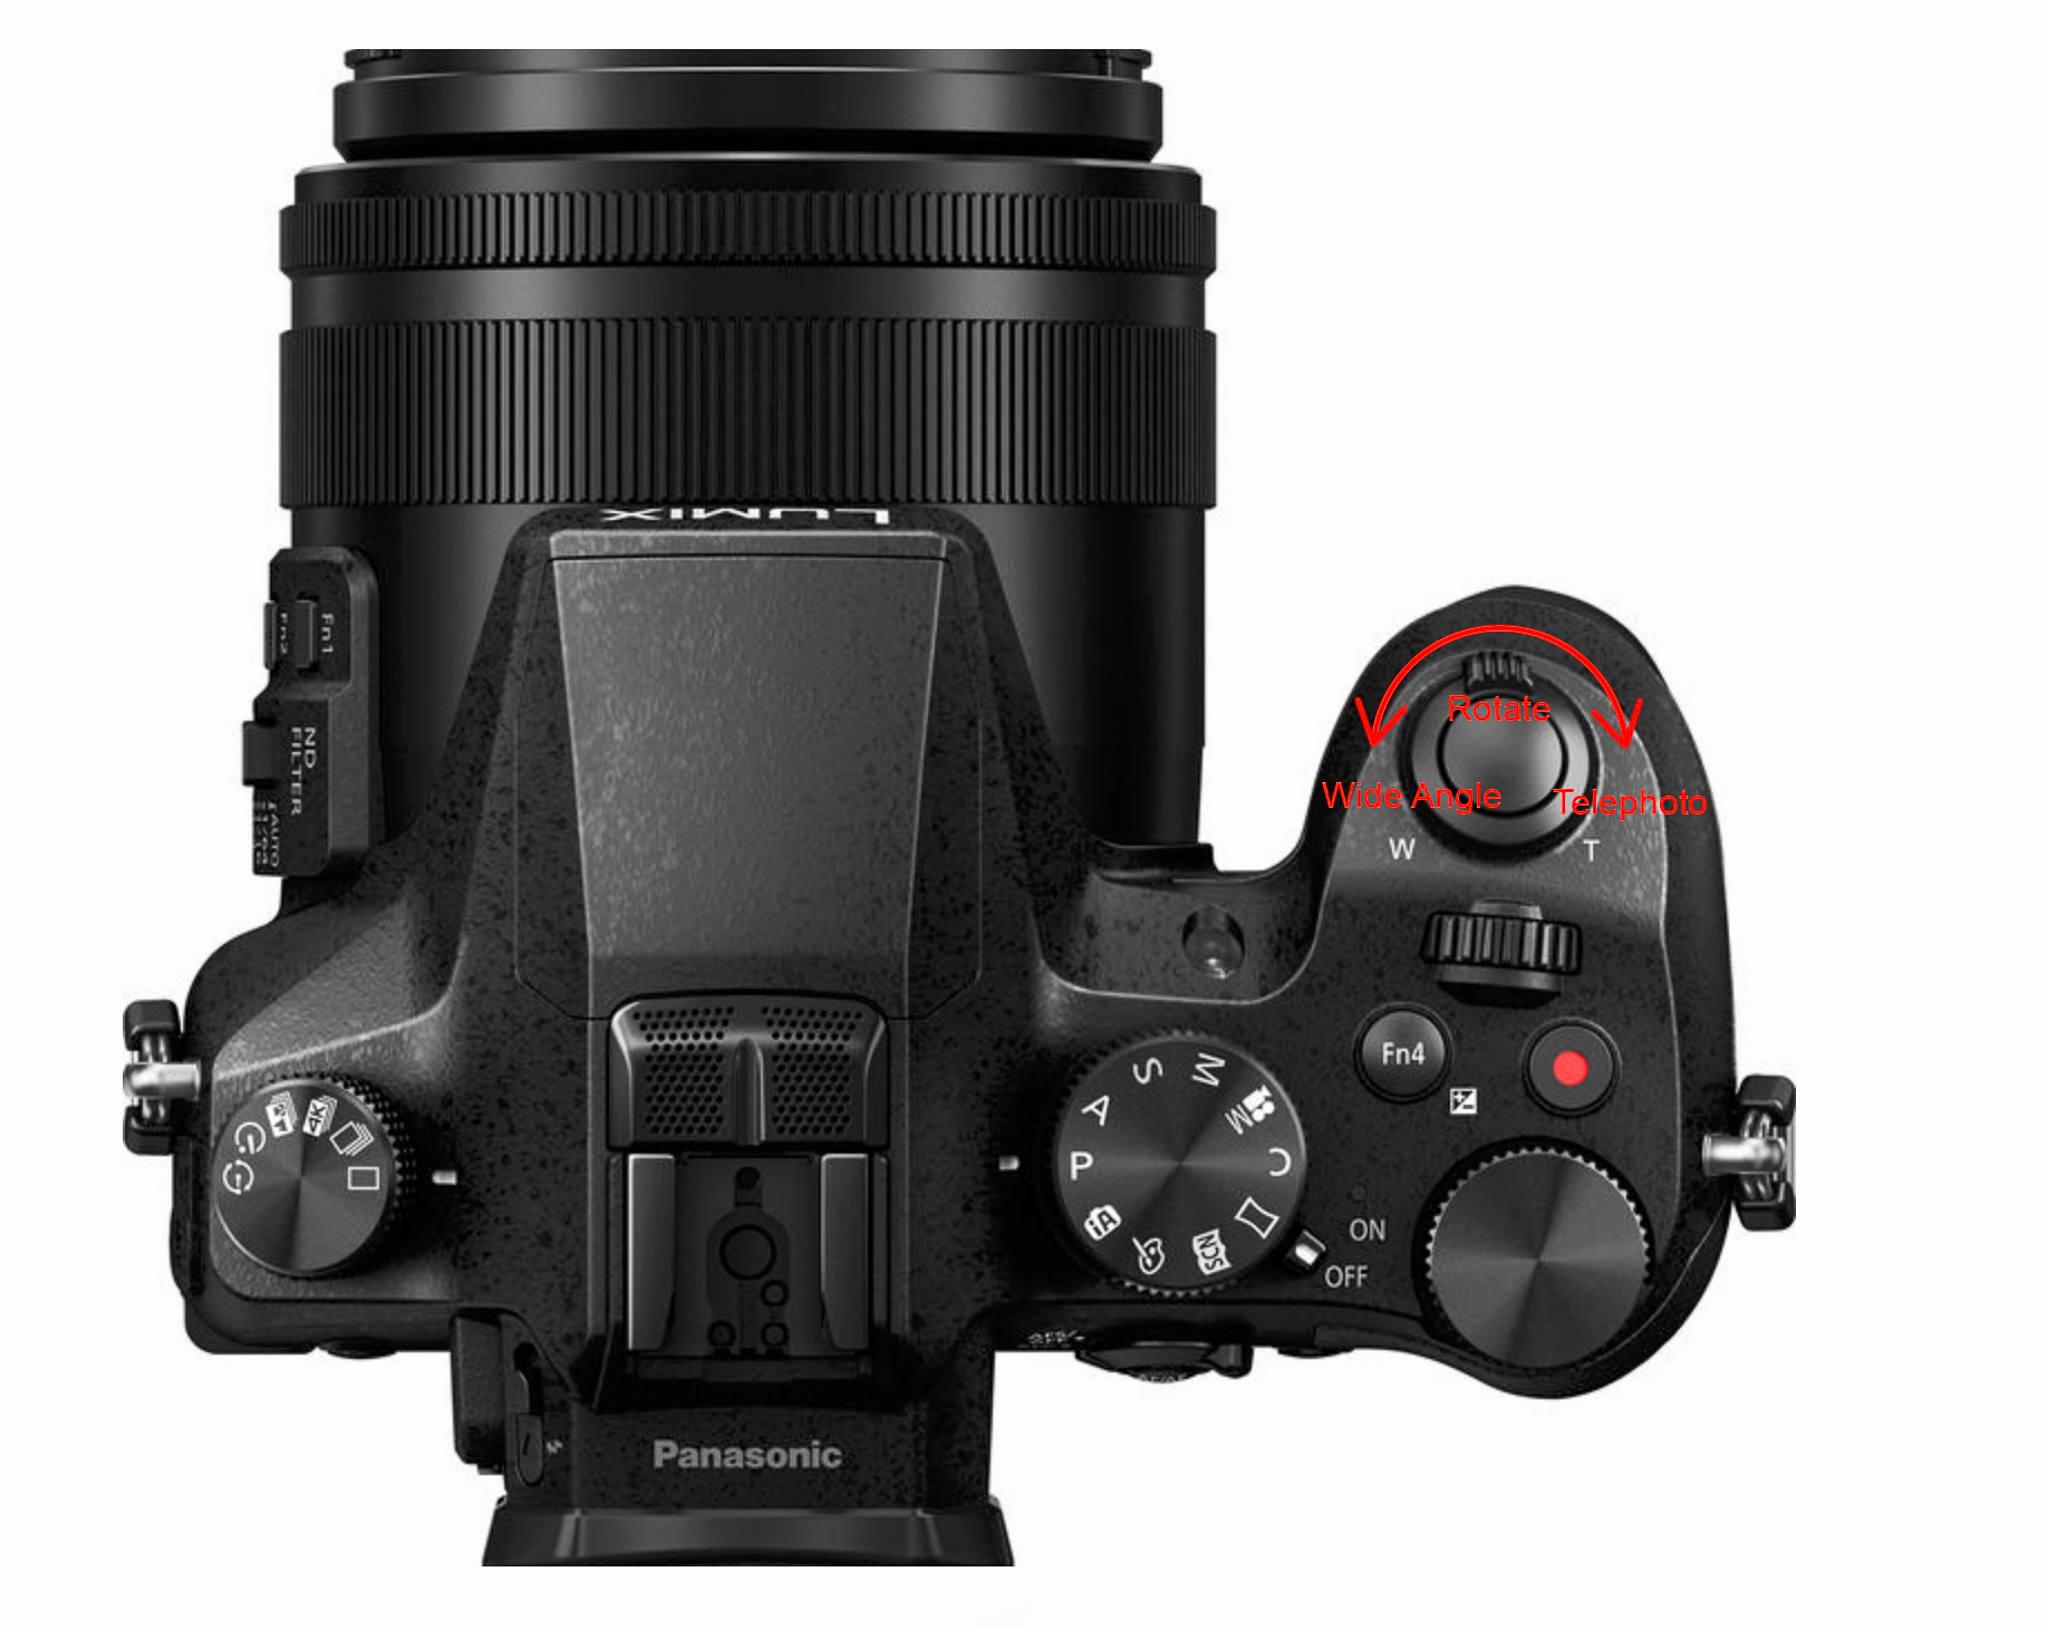 Zoom_06_Panasonic Lumix_DMC-FZ2500